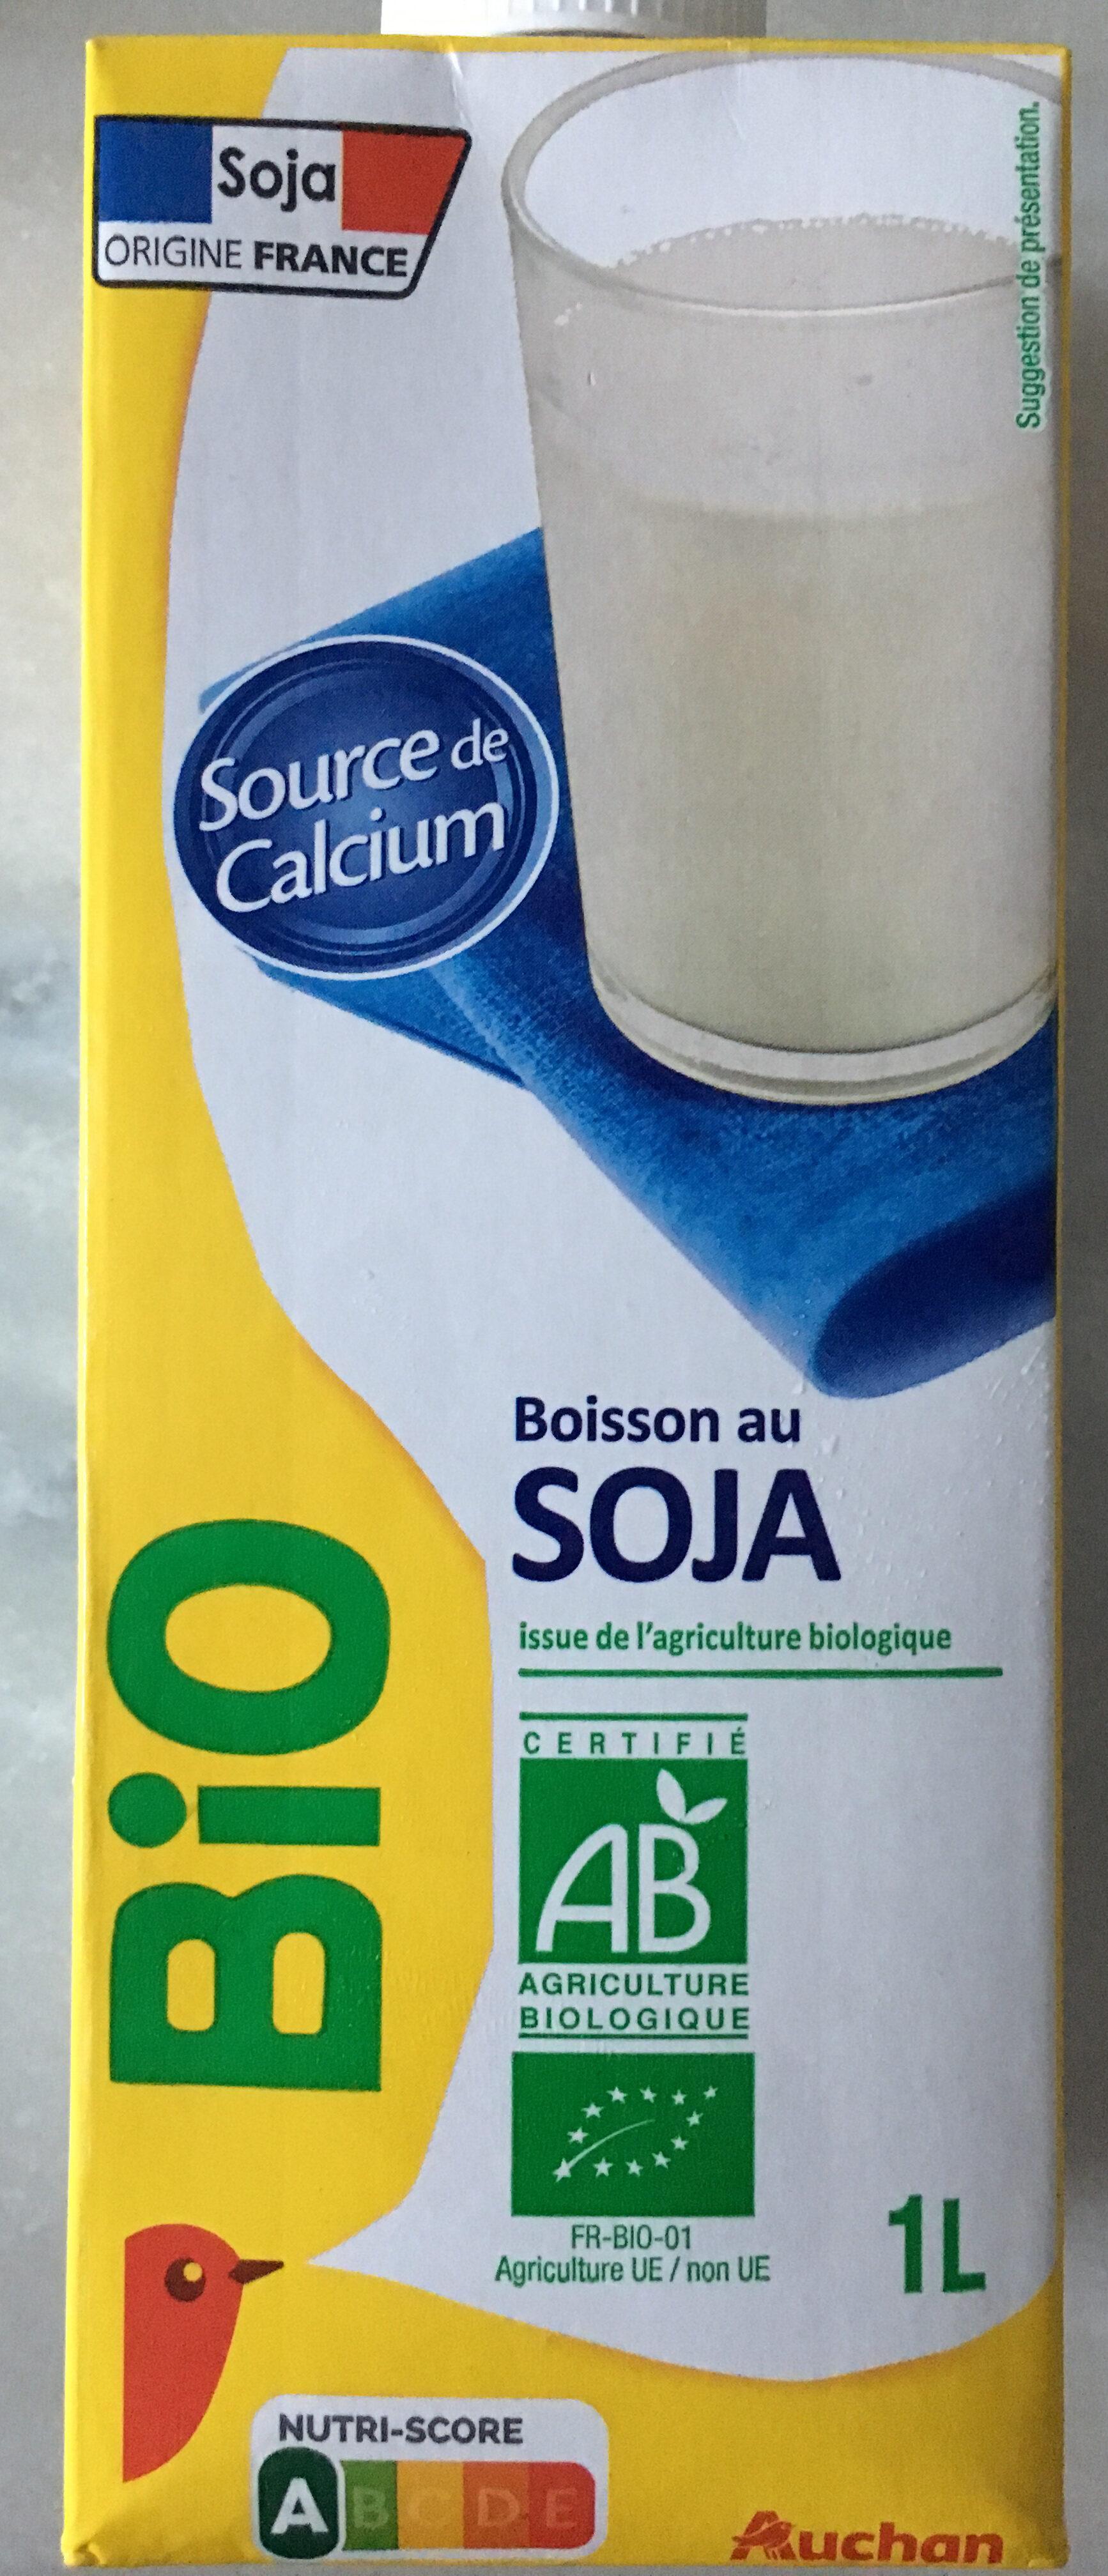 Boisson au Soja - Produit